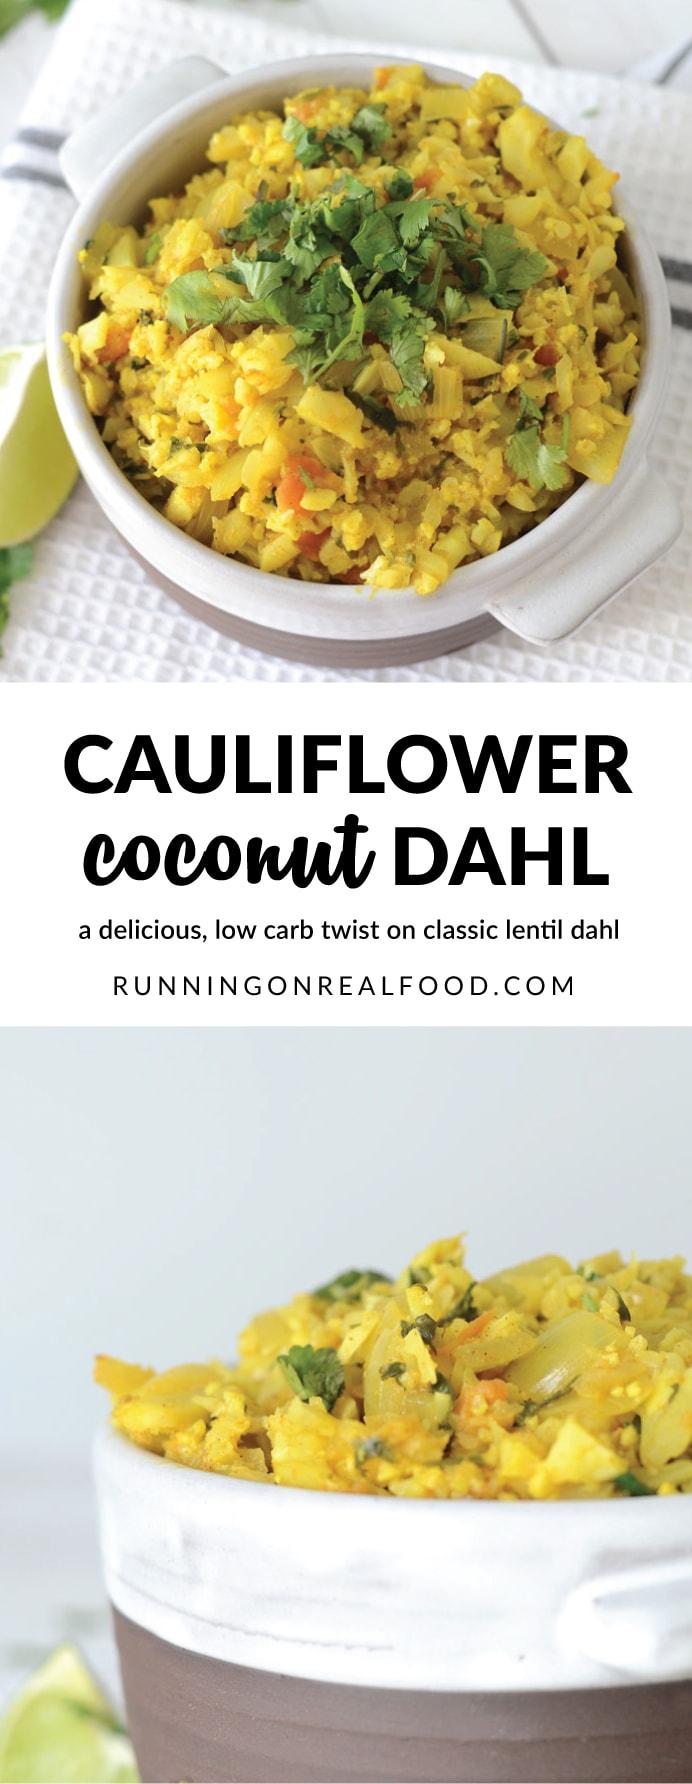 Cauliflower Coconut Dahl